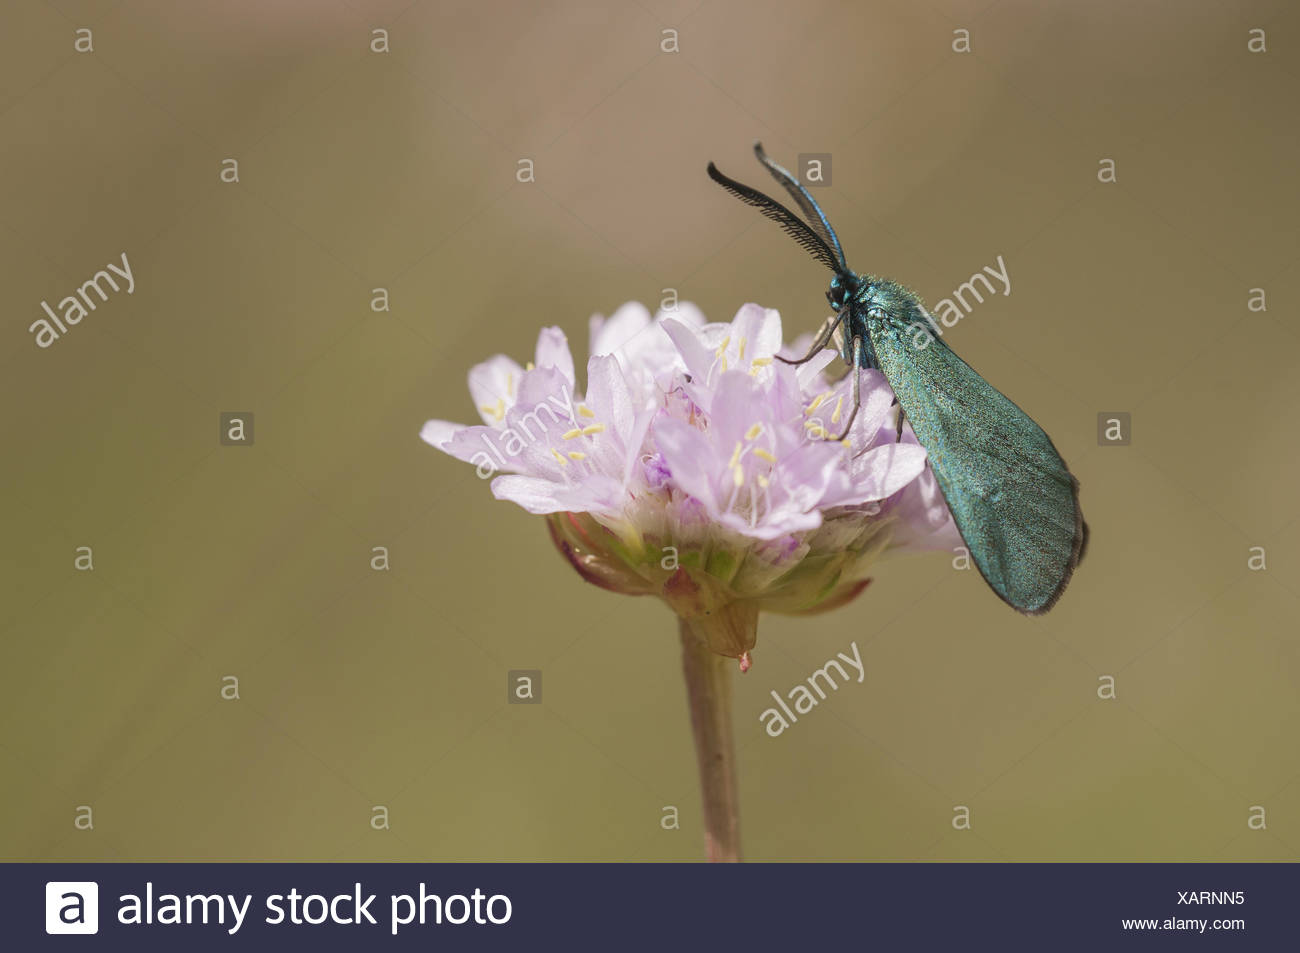 Förster (Procridinae), Deutschland Stockbild